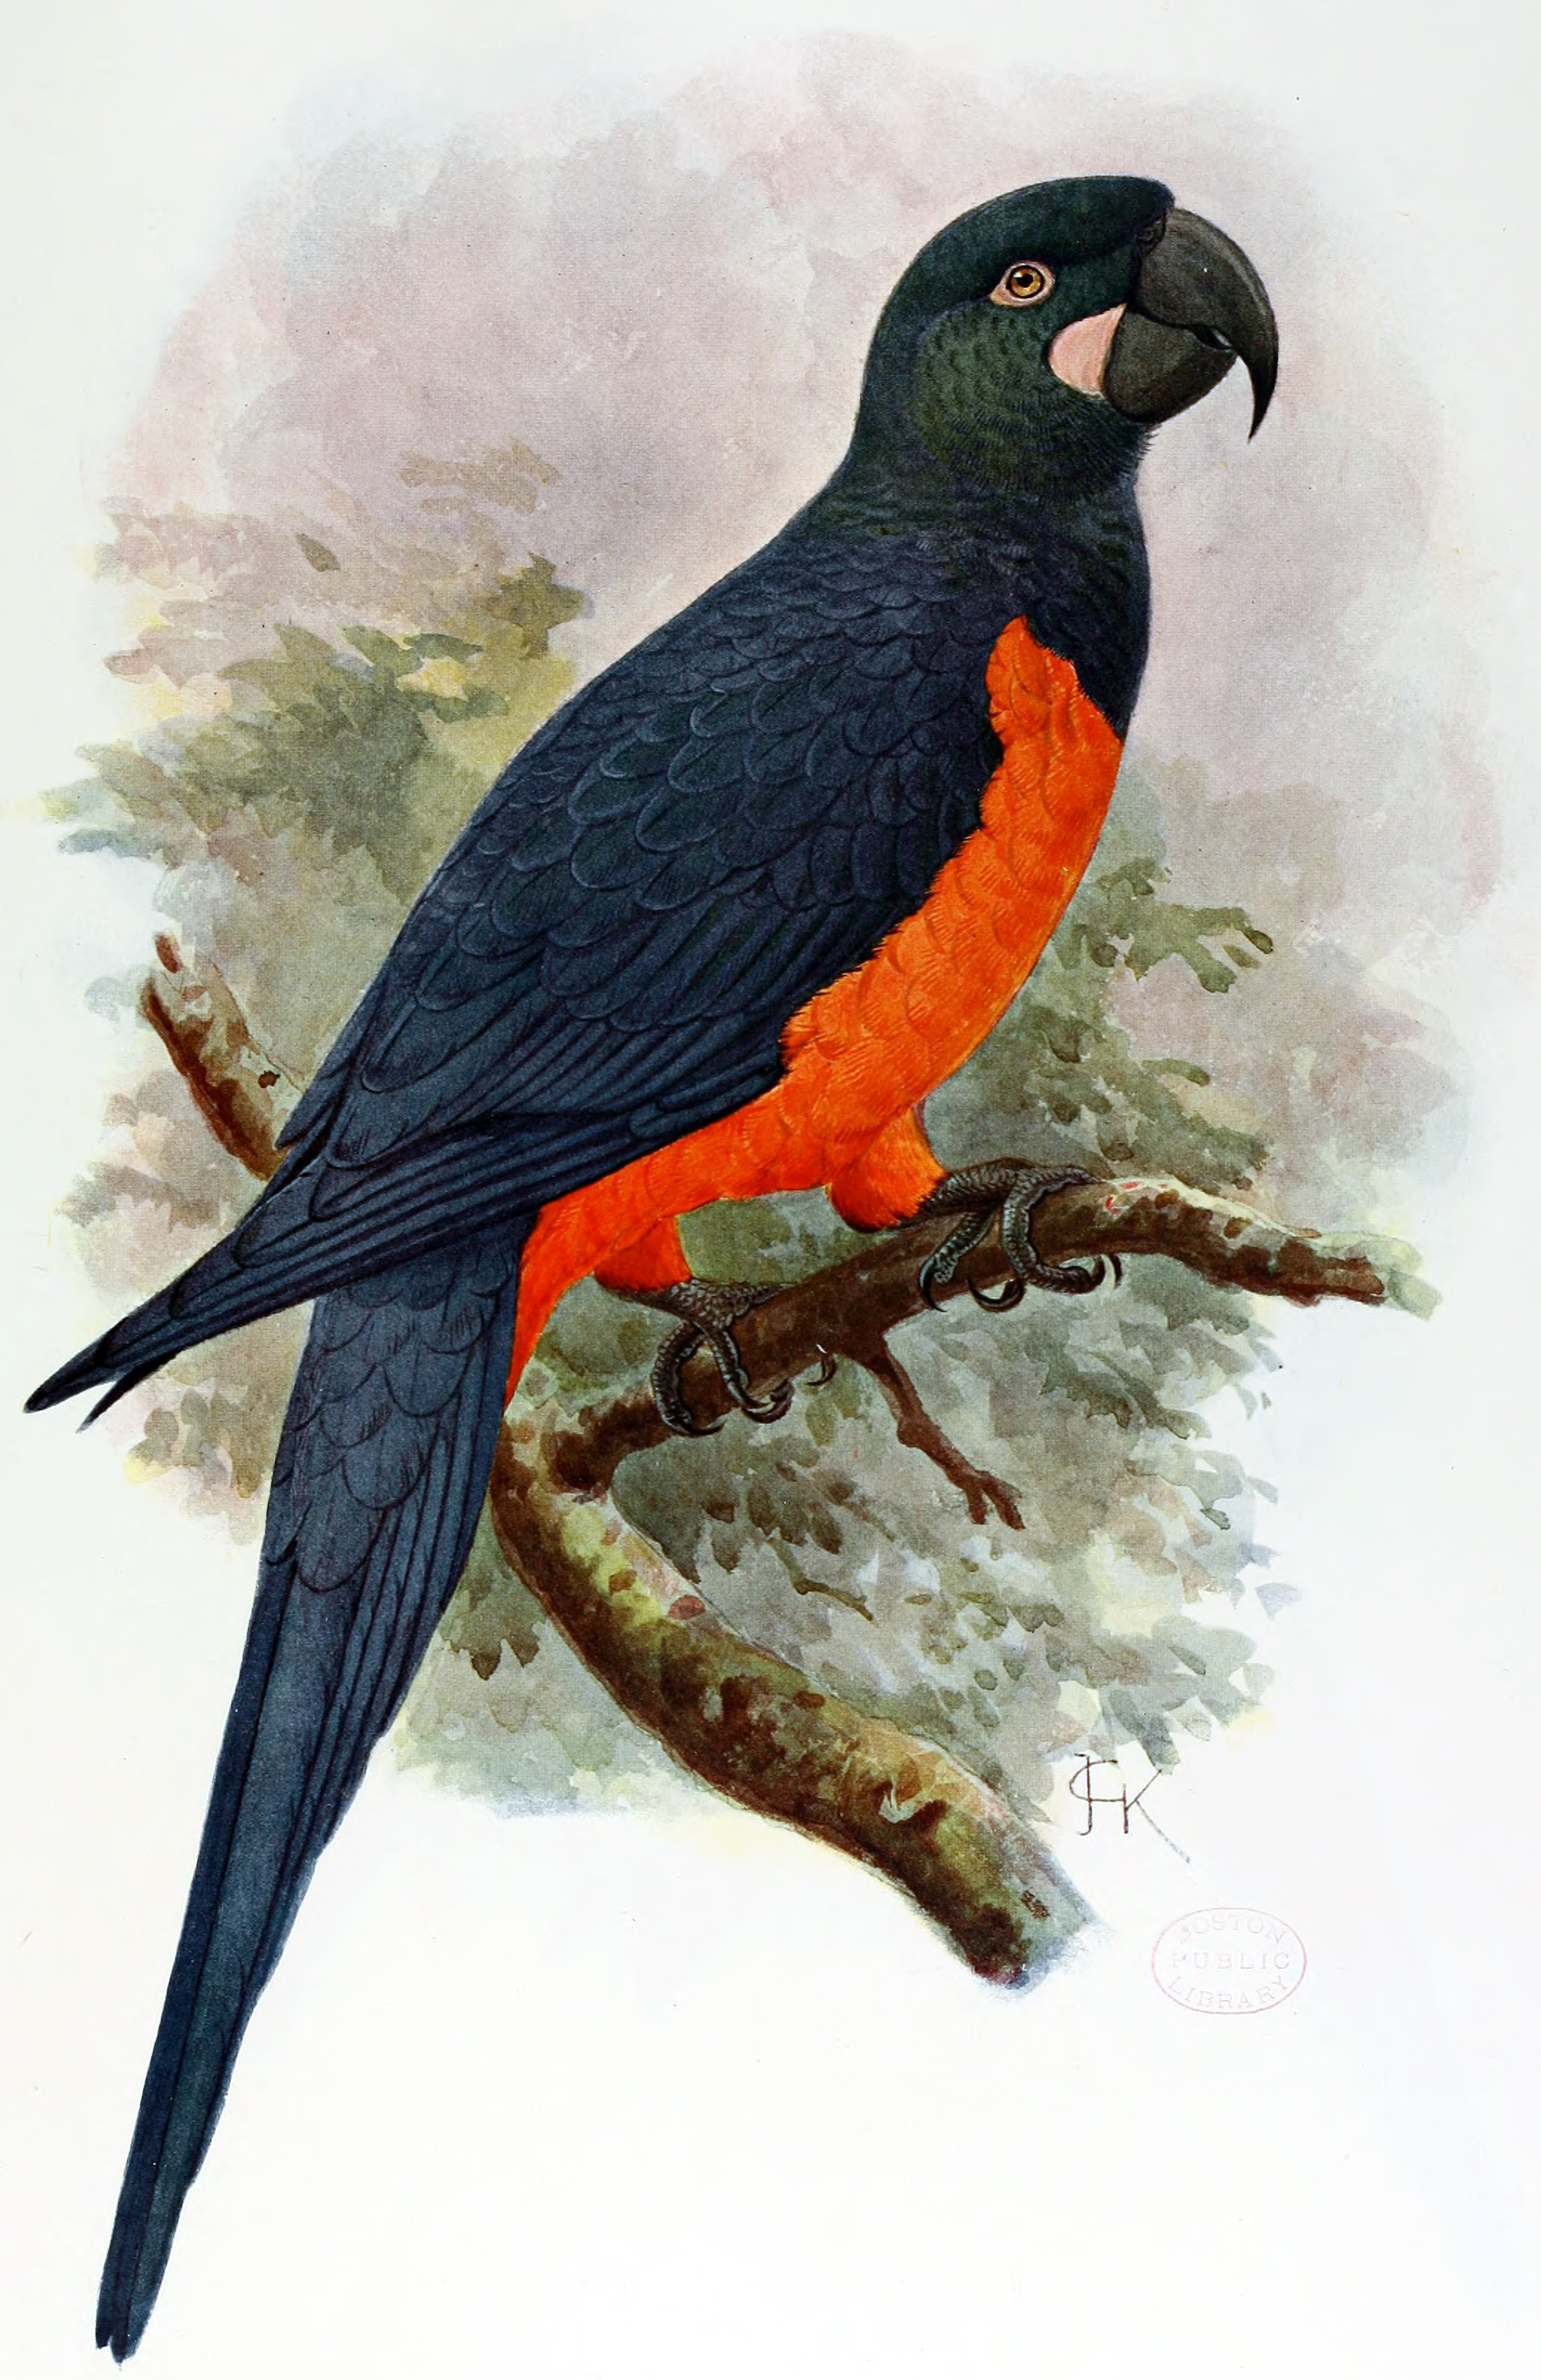 https://upload.wikimedia.org/wikipedia/commons/7/75/Ara_martinica.jpg